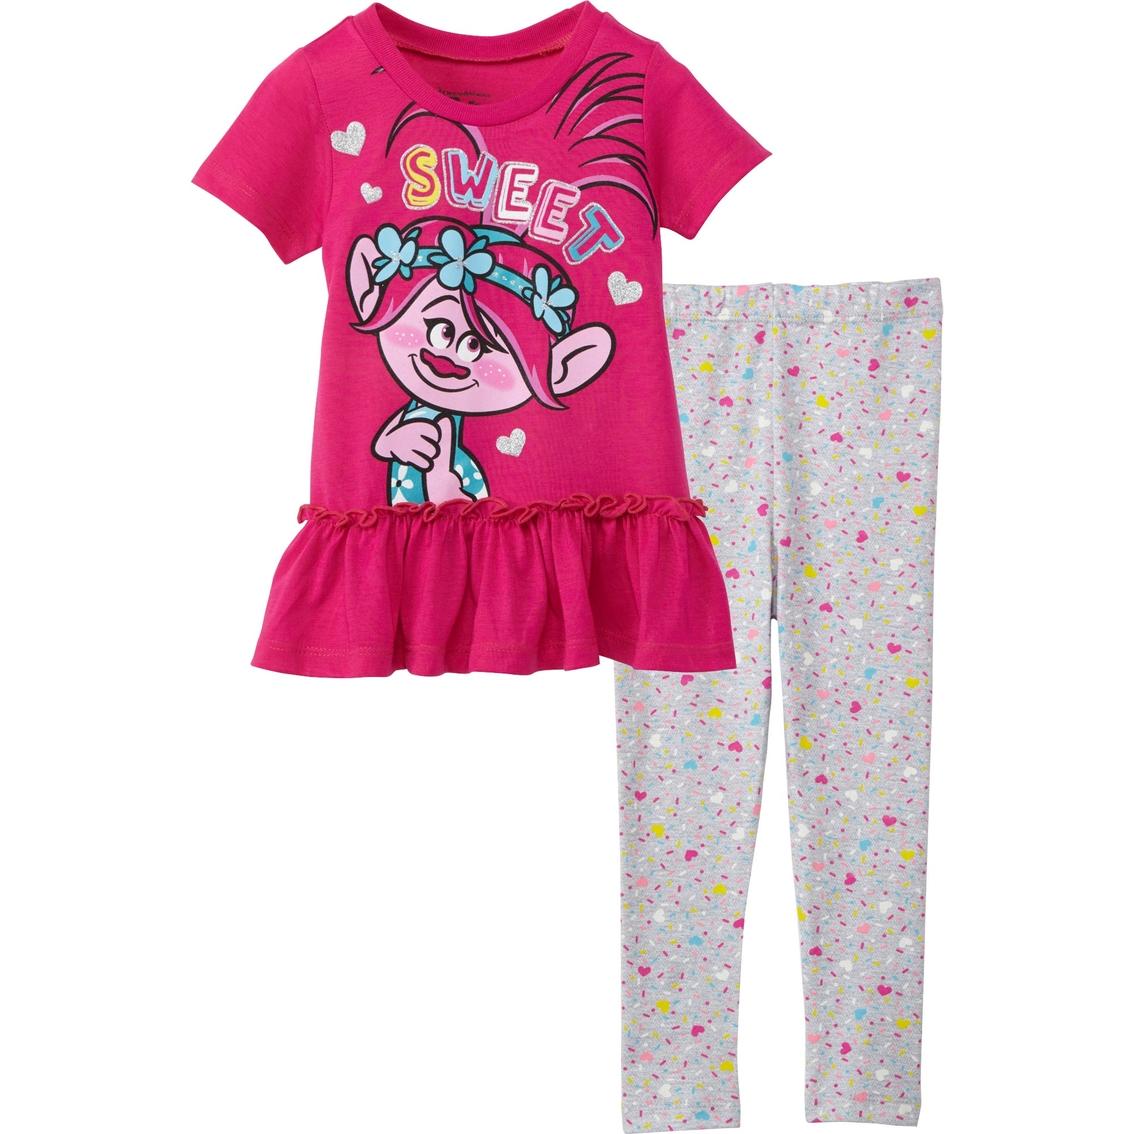 83a24488d Dreamworks Toddler Girls Trolls Shirt And Leggings Set   Toddler ...